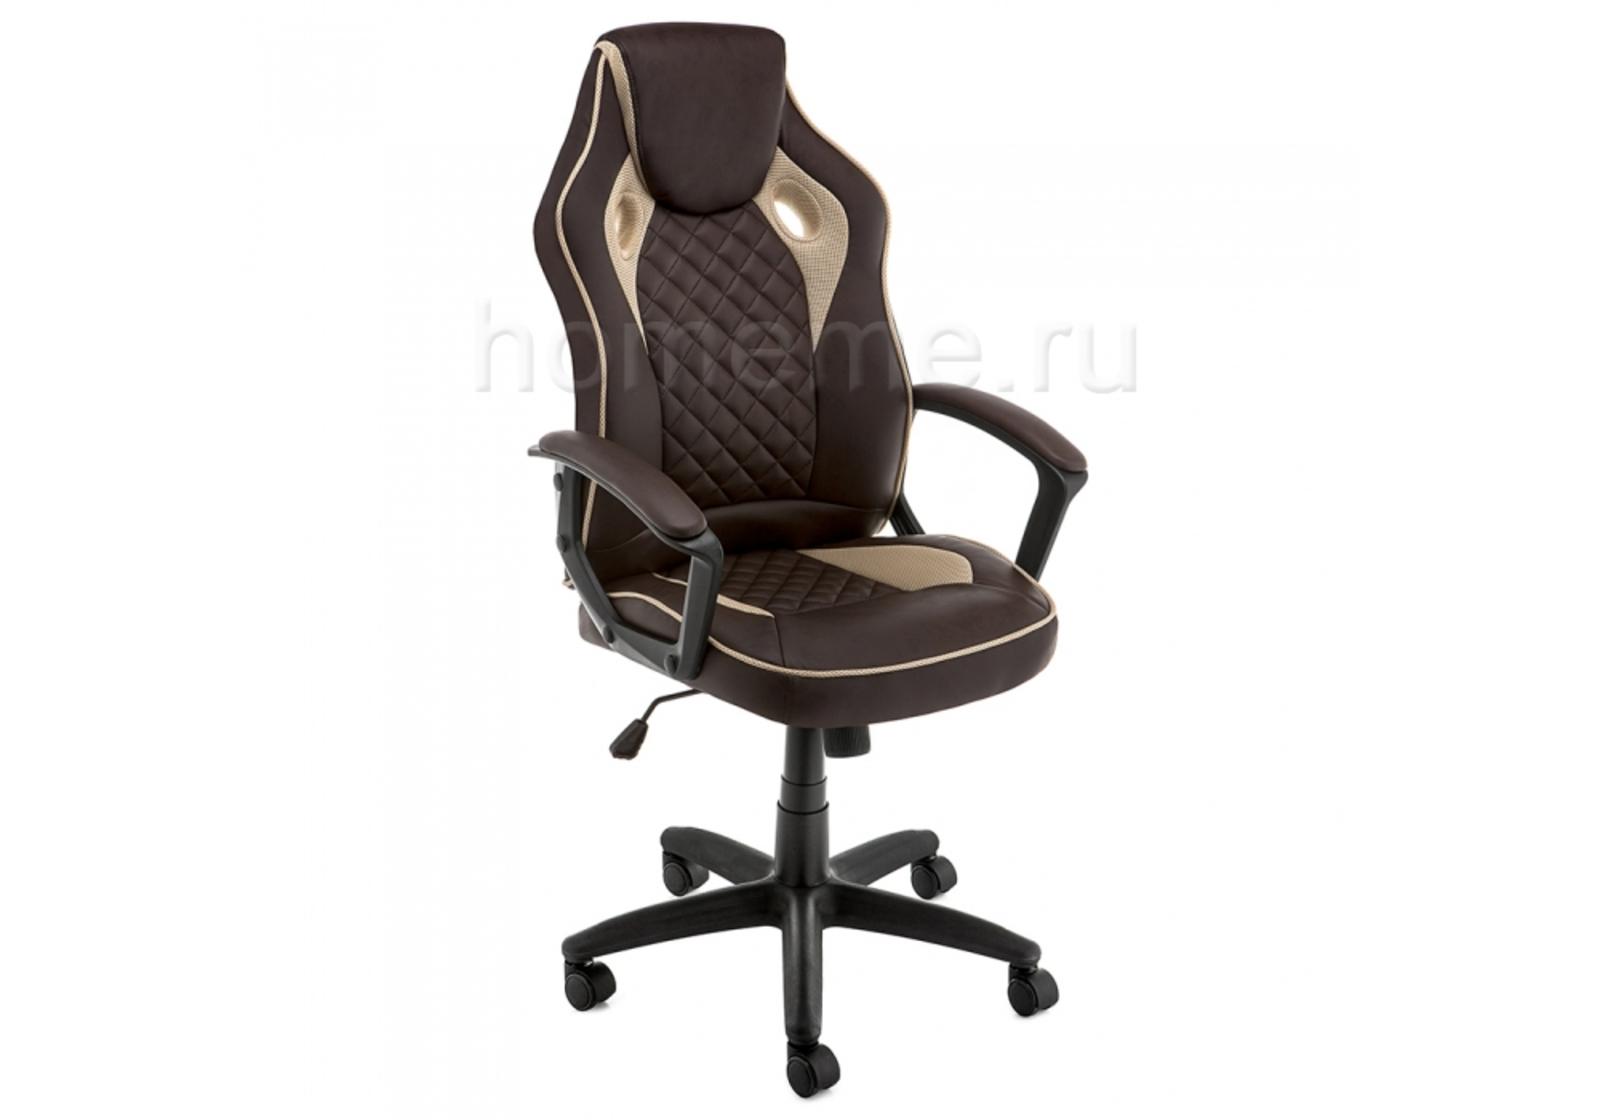 Кресло для офиса HomeMe Raid коричневое 11321 от Homeme.ru